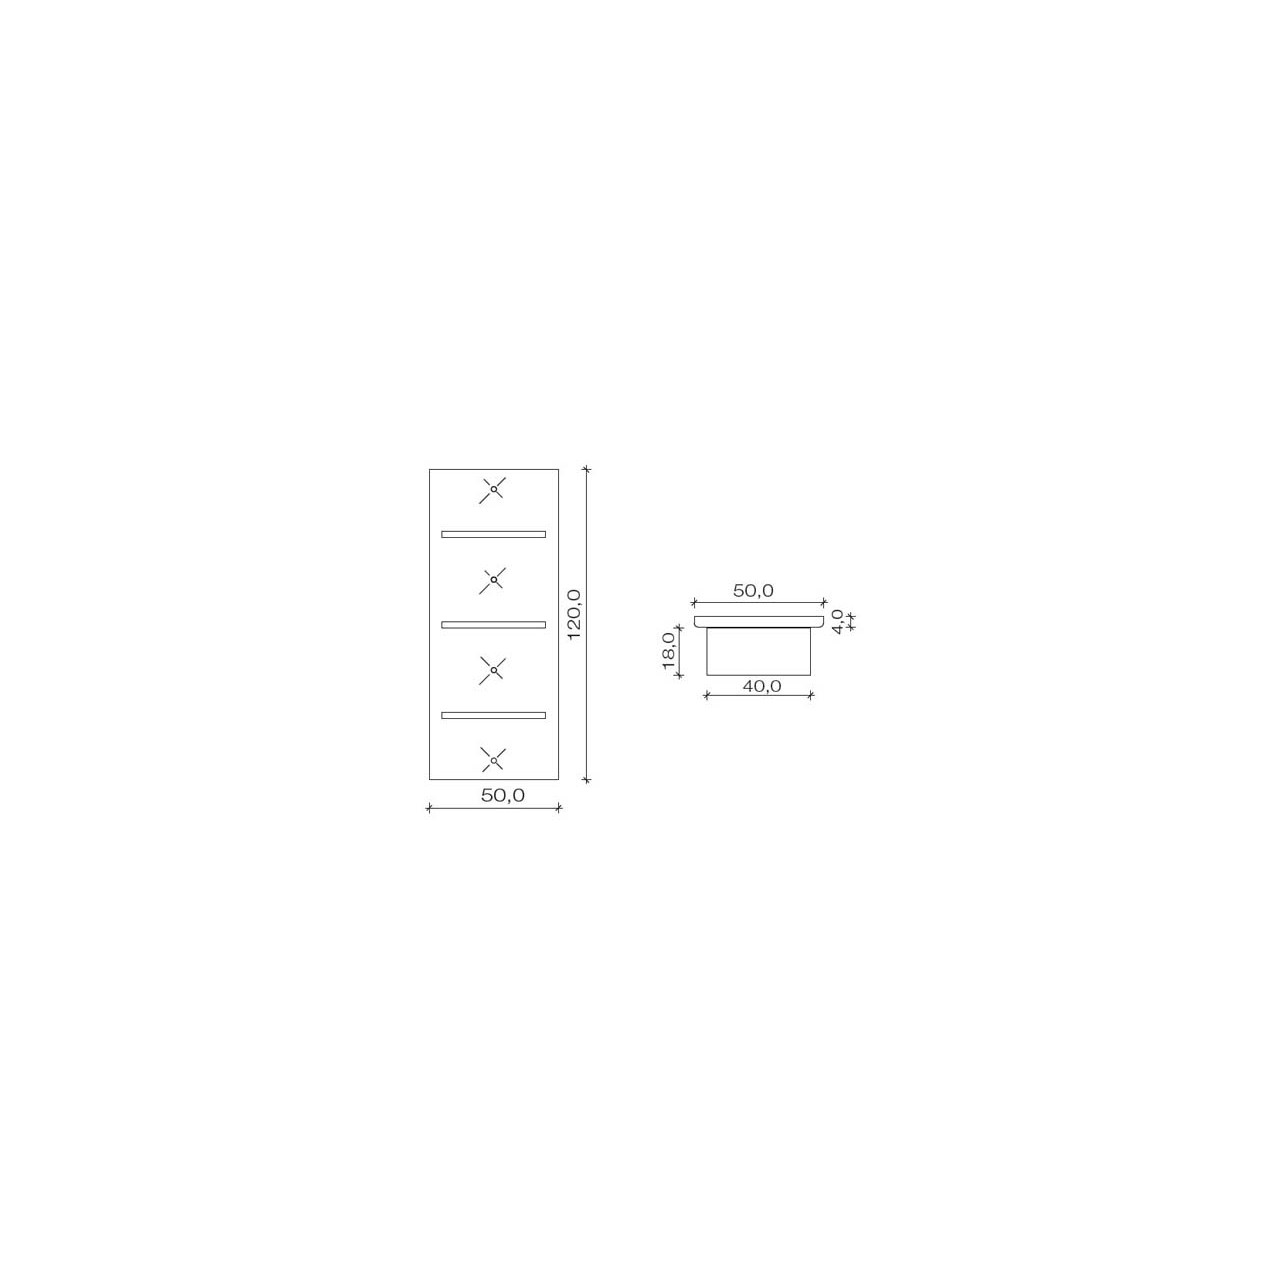 Decor with Shelves